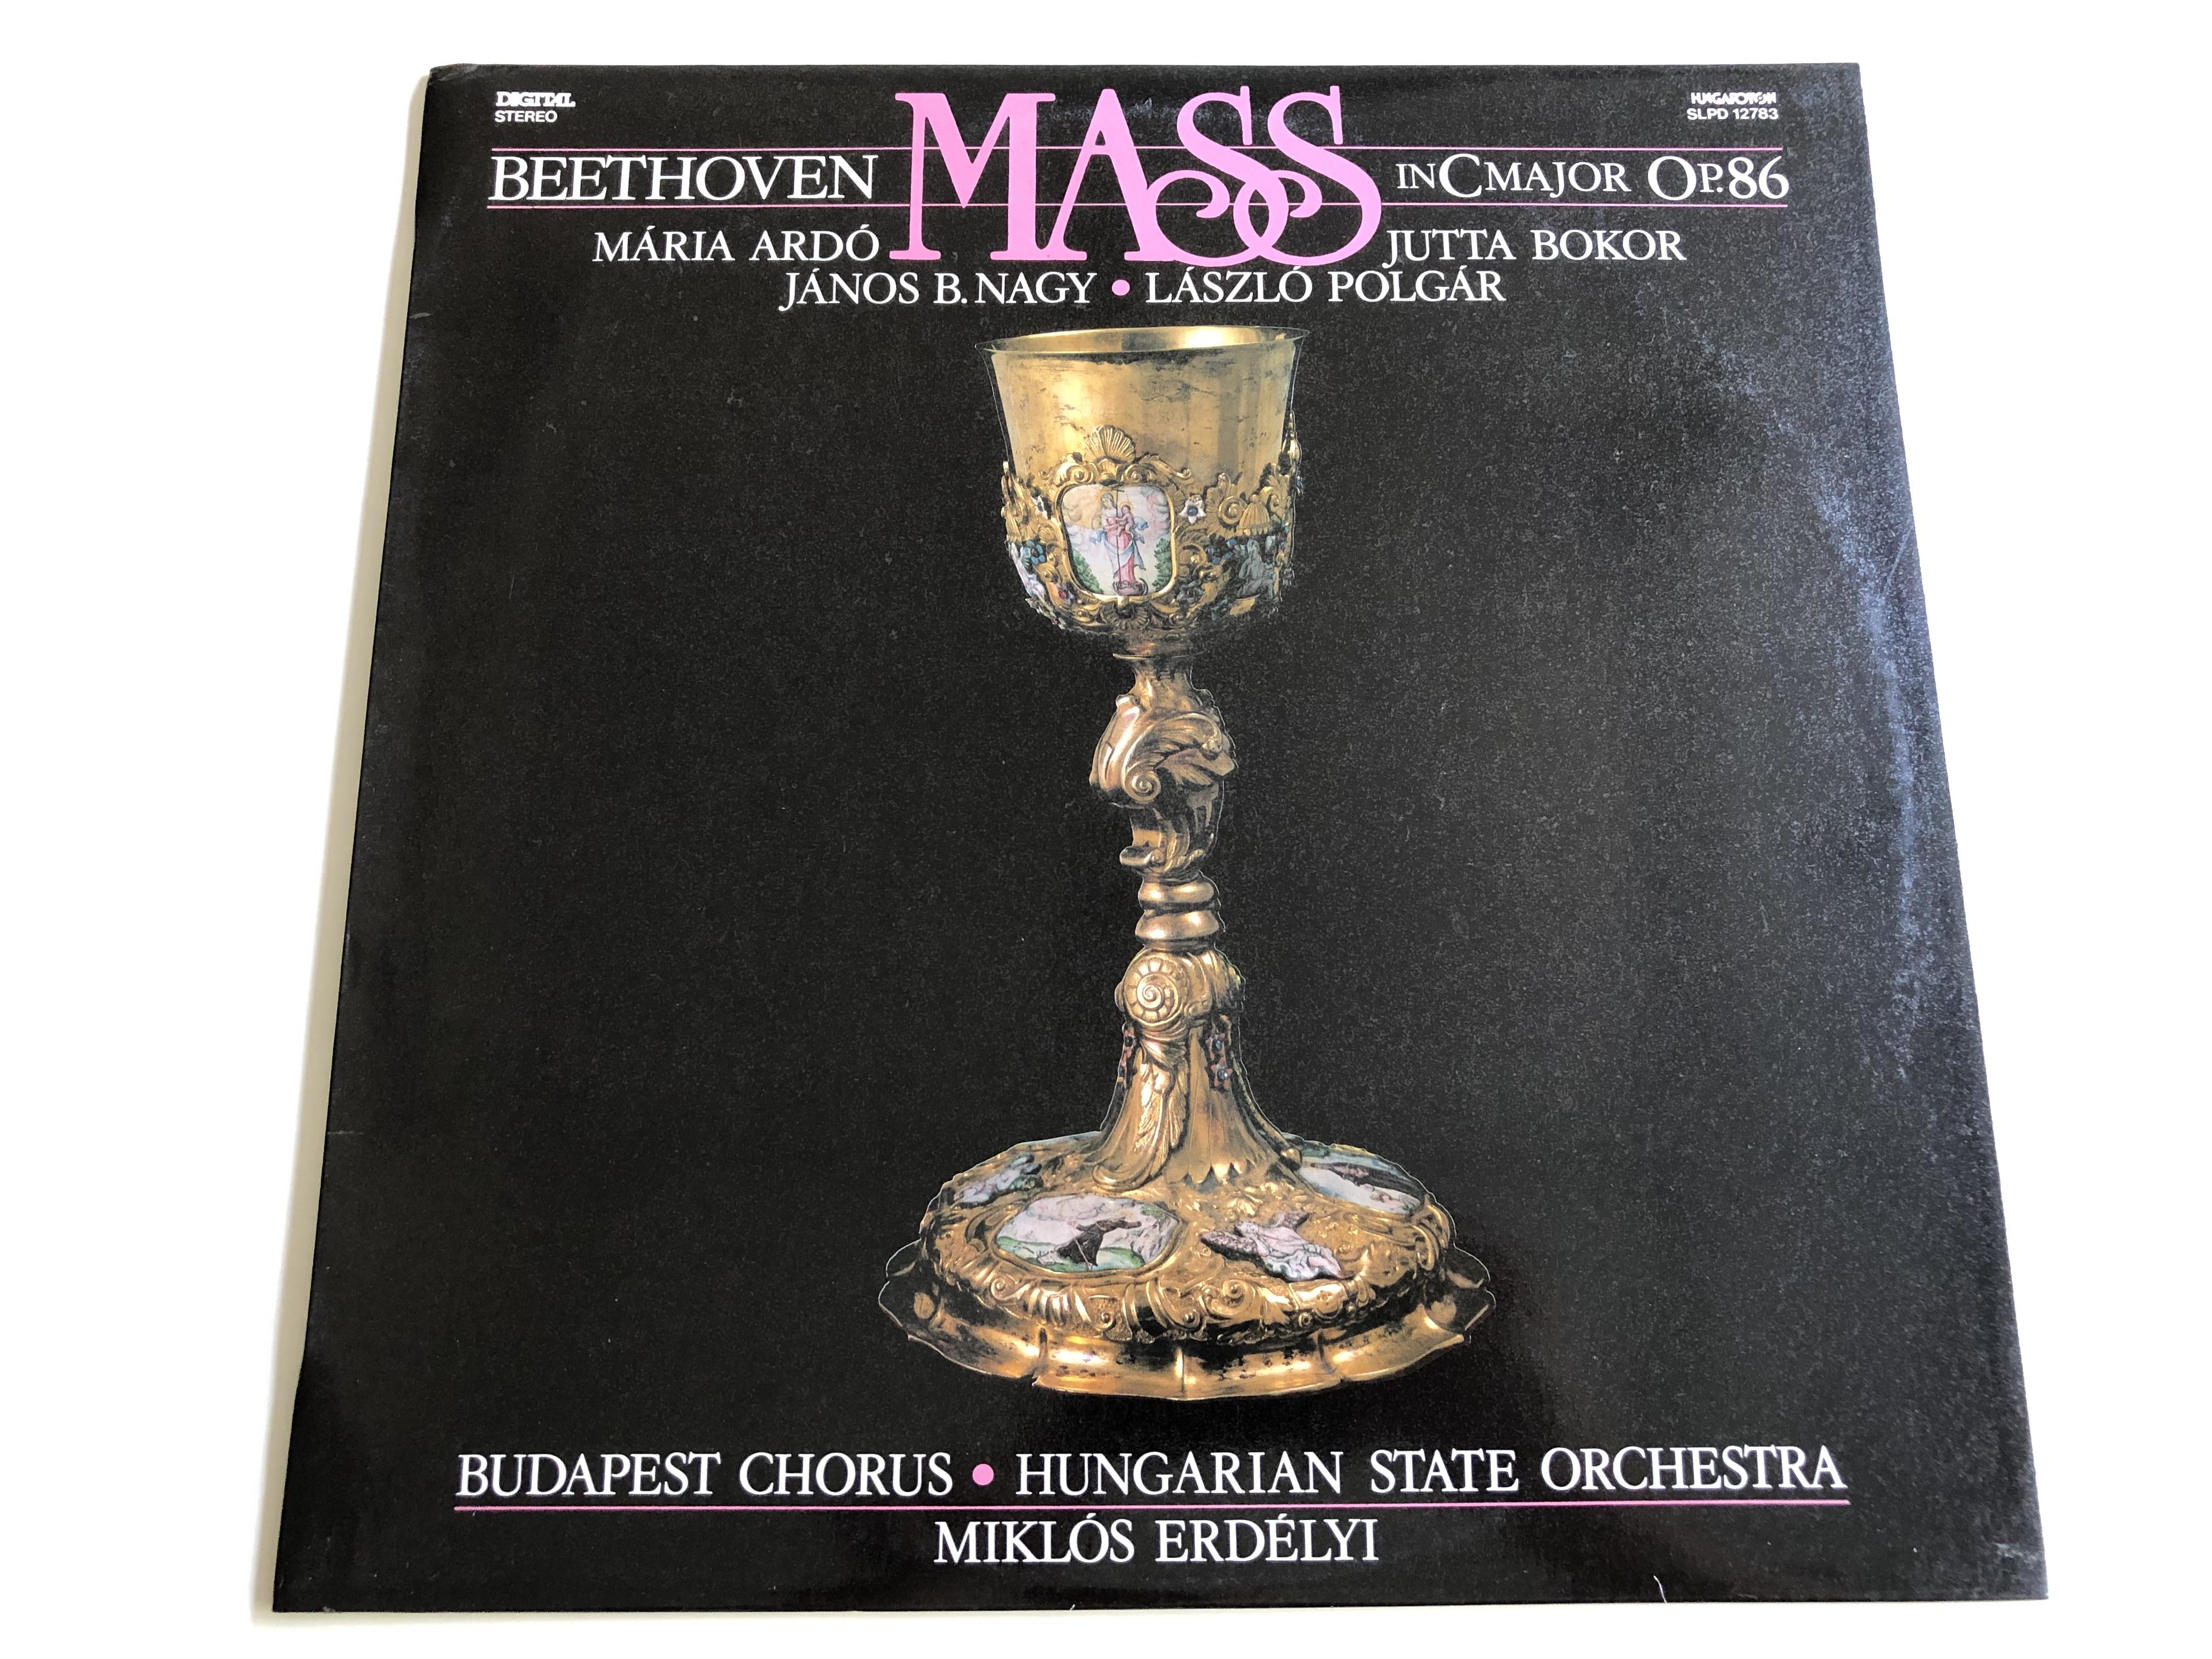 beethoven-mass-in-c-major-op.-86-m-ria-ard-jutta-bokor-j-nos-b.-nagy-l-szl-polg-r-budapest-chorus-hungarian-state-orchestra-conducted-by-mikl-s-erd-lyi-hungaroton-1986-slpd-12783-digital-stereo-1-.jpg